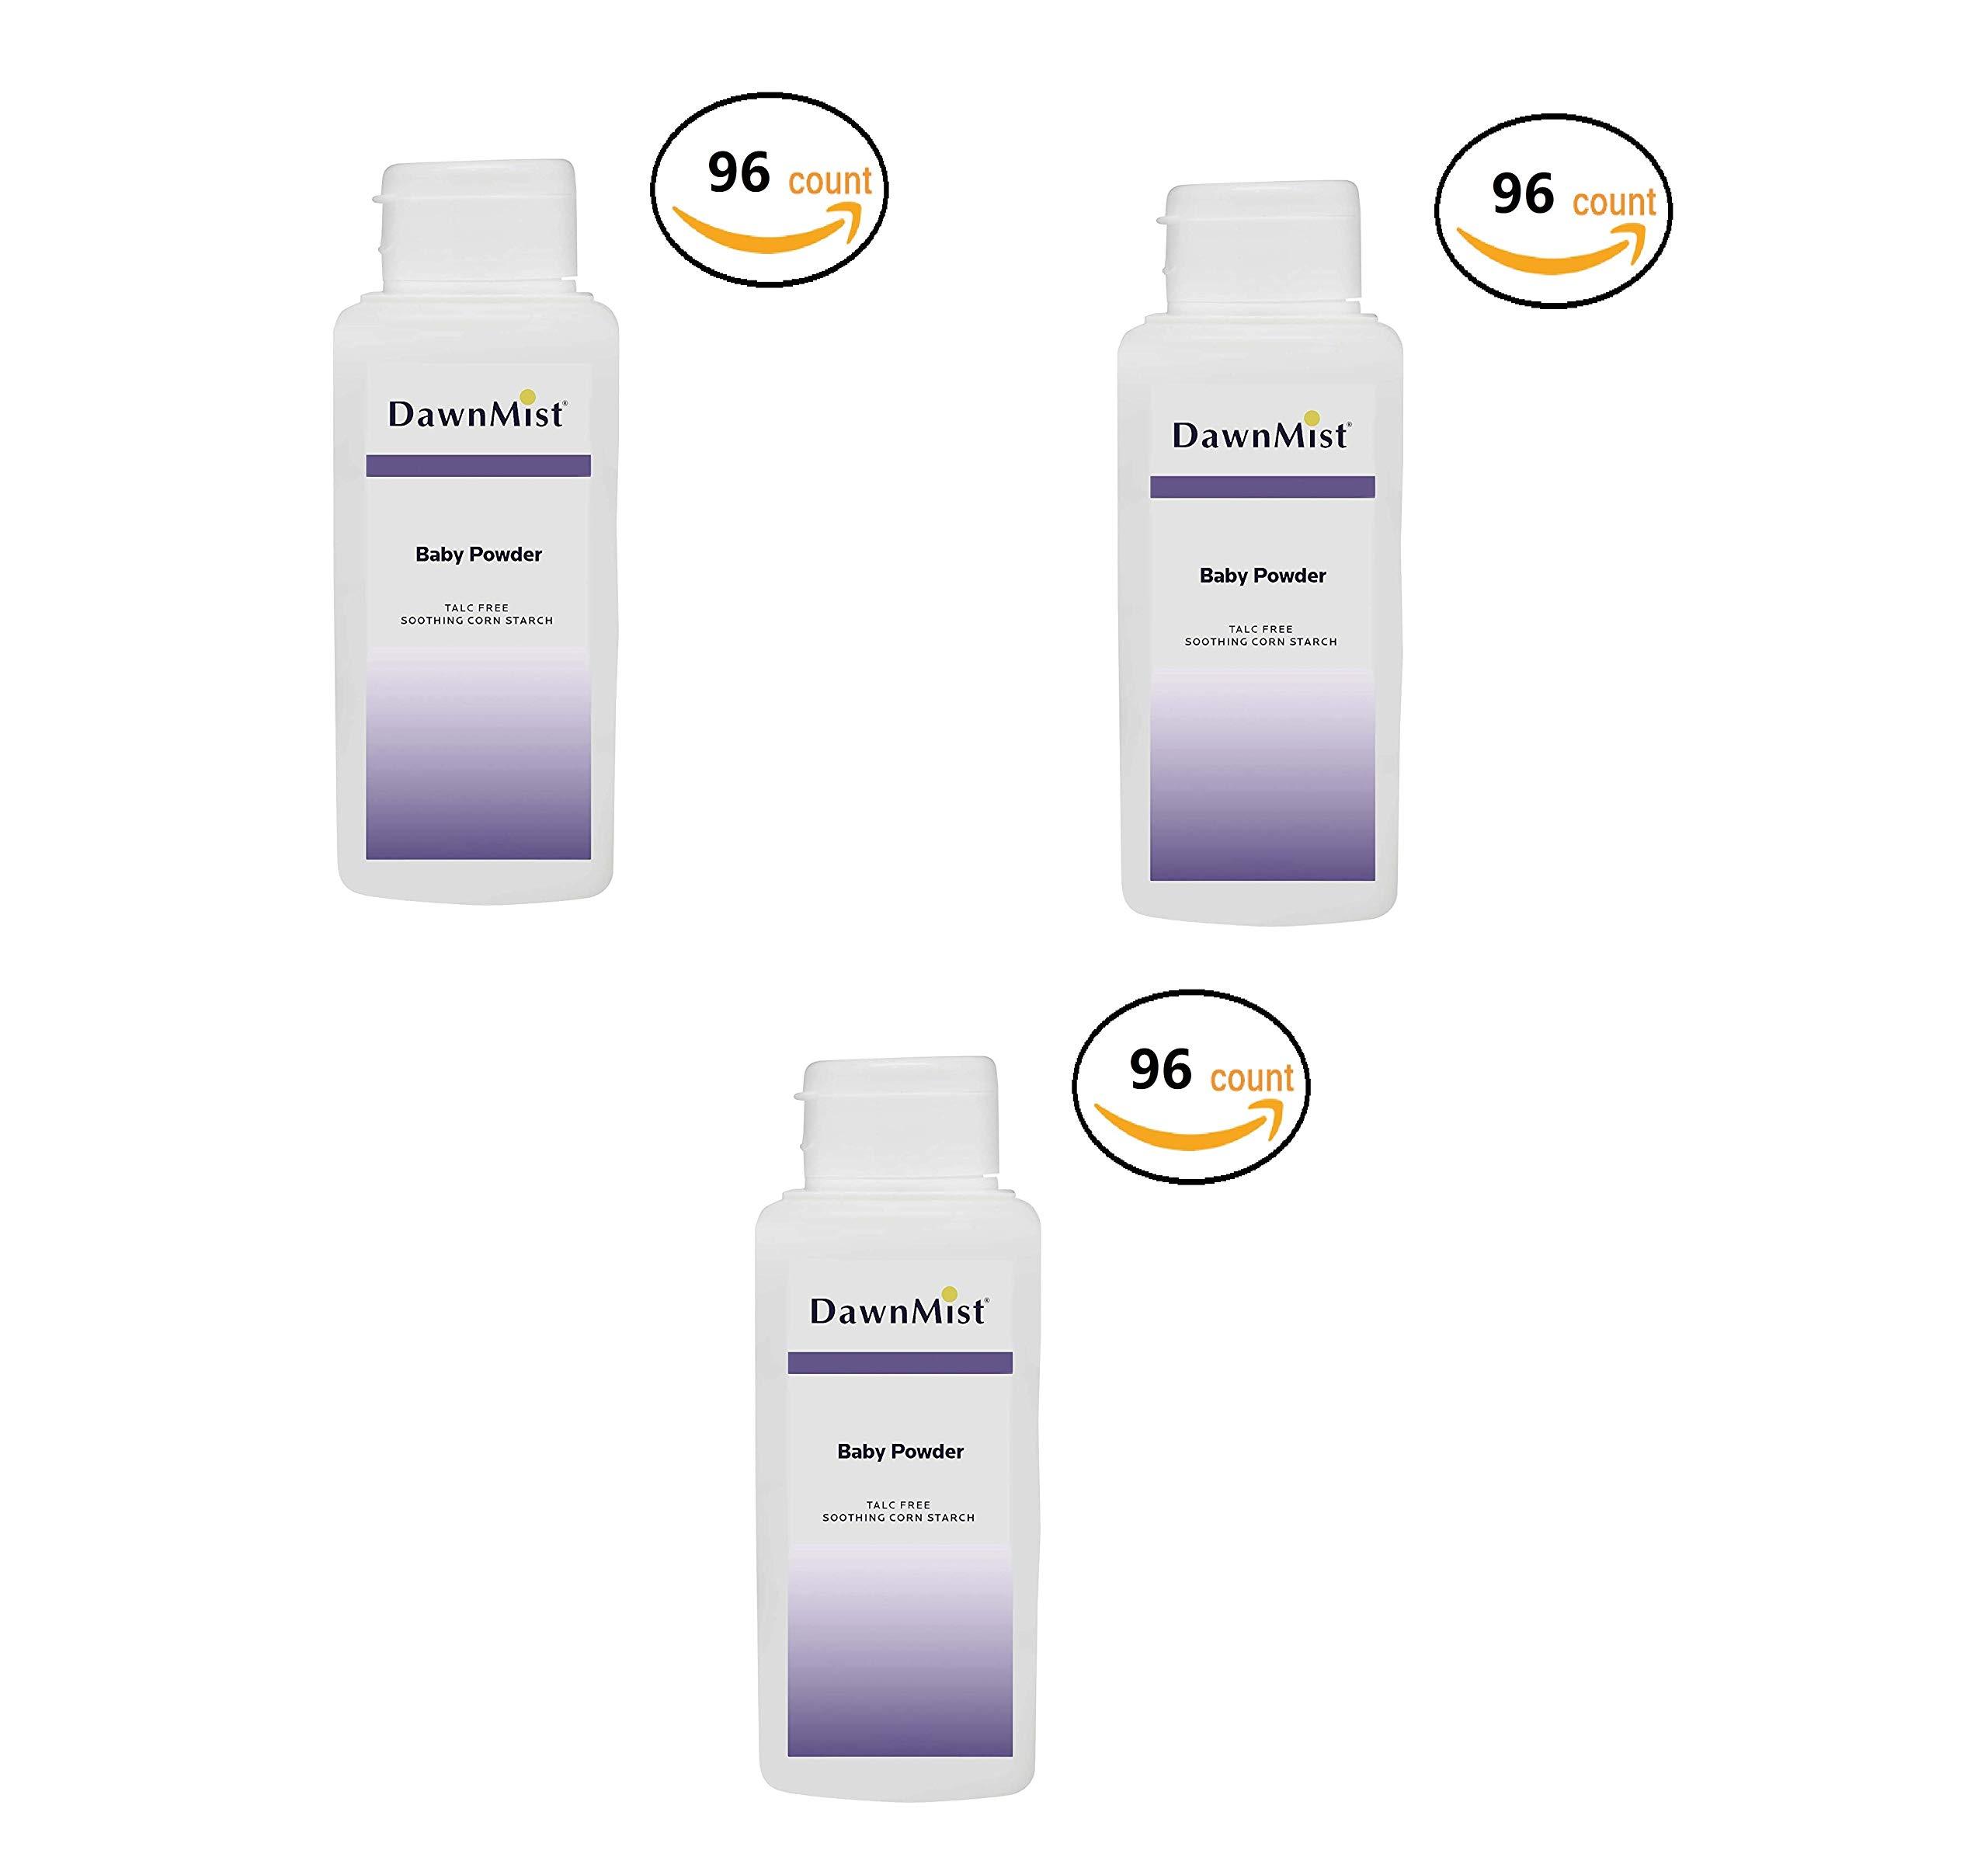 Dukal BP02 Dawn Mist Baby Powder, Cornstarch, 2 oz, 96 Count (3 Pack)